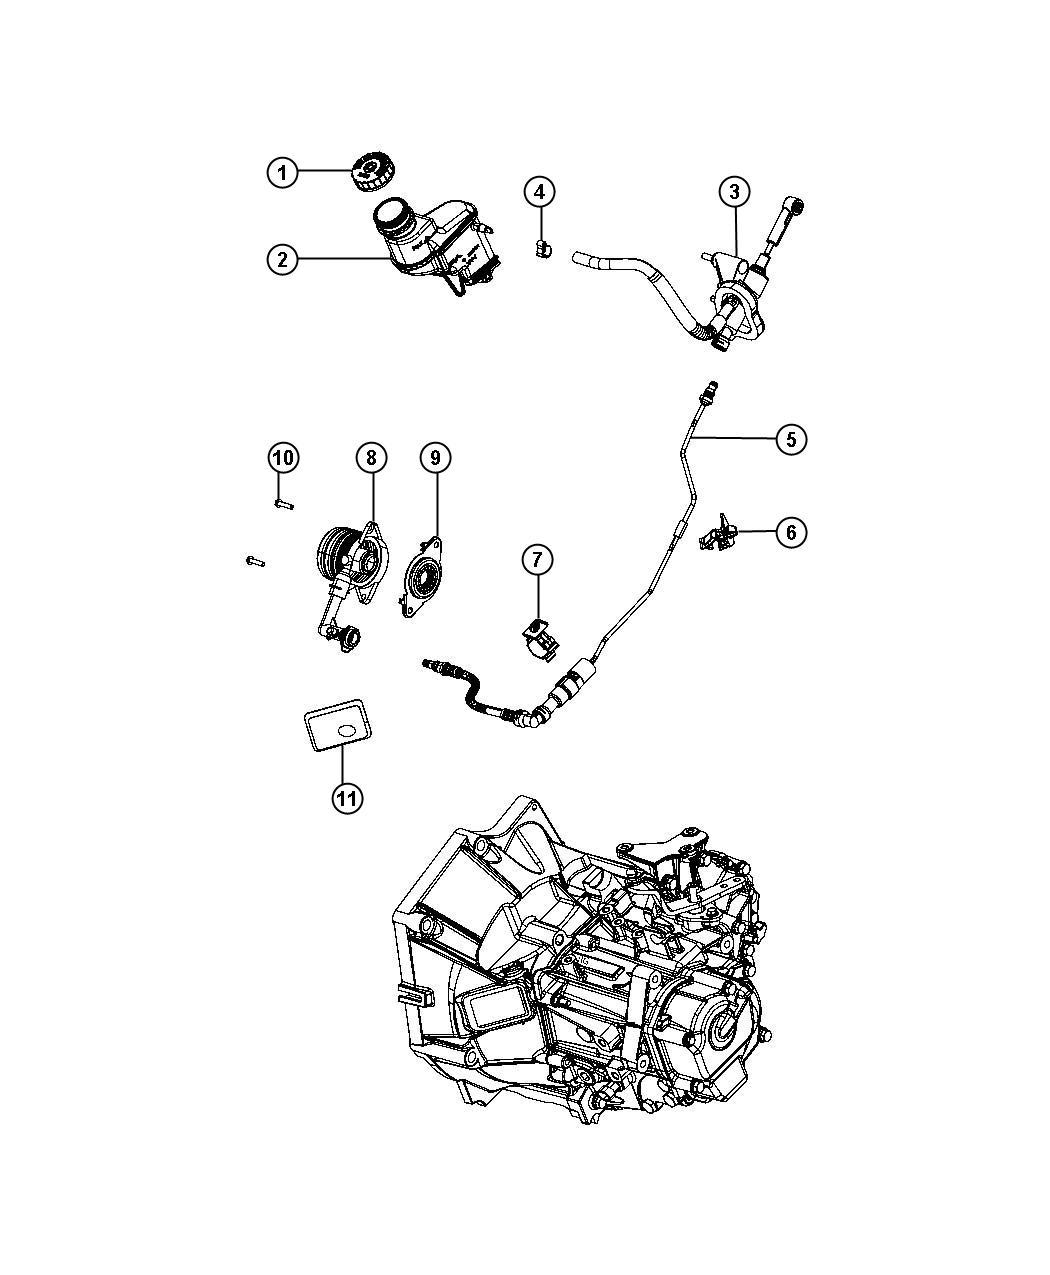 Fiat 500 Clip. Retainer. Hydraulic, controls, clutch